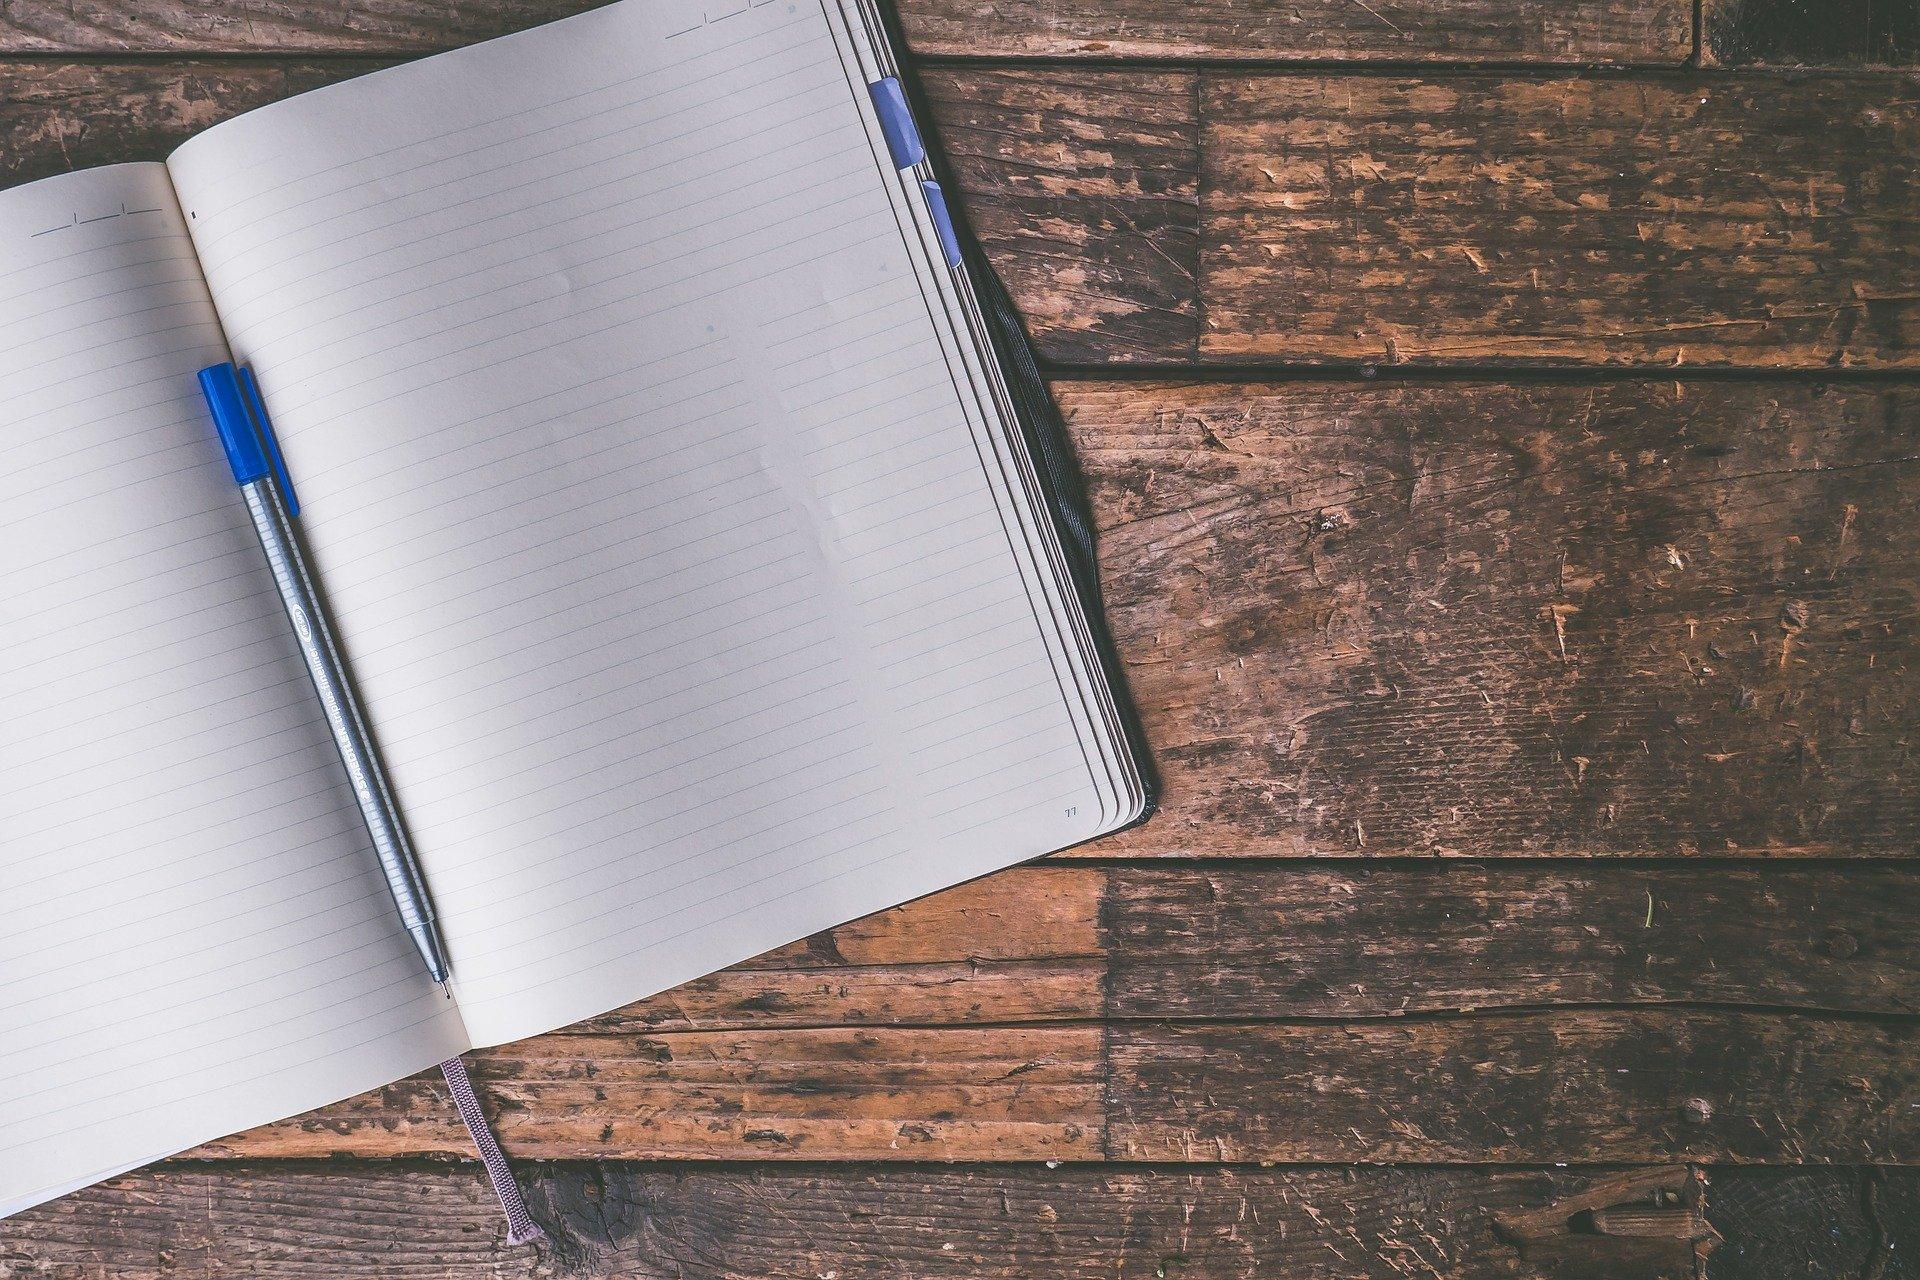 dissertation editing help services